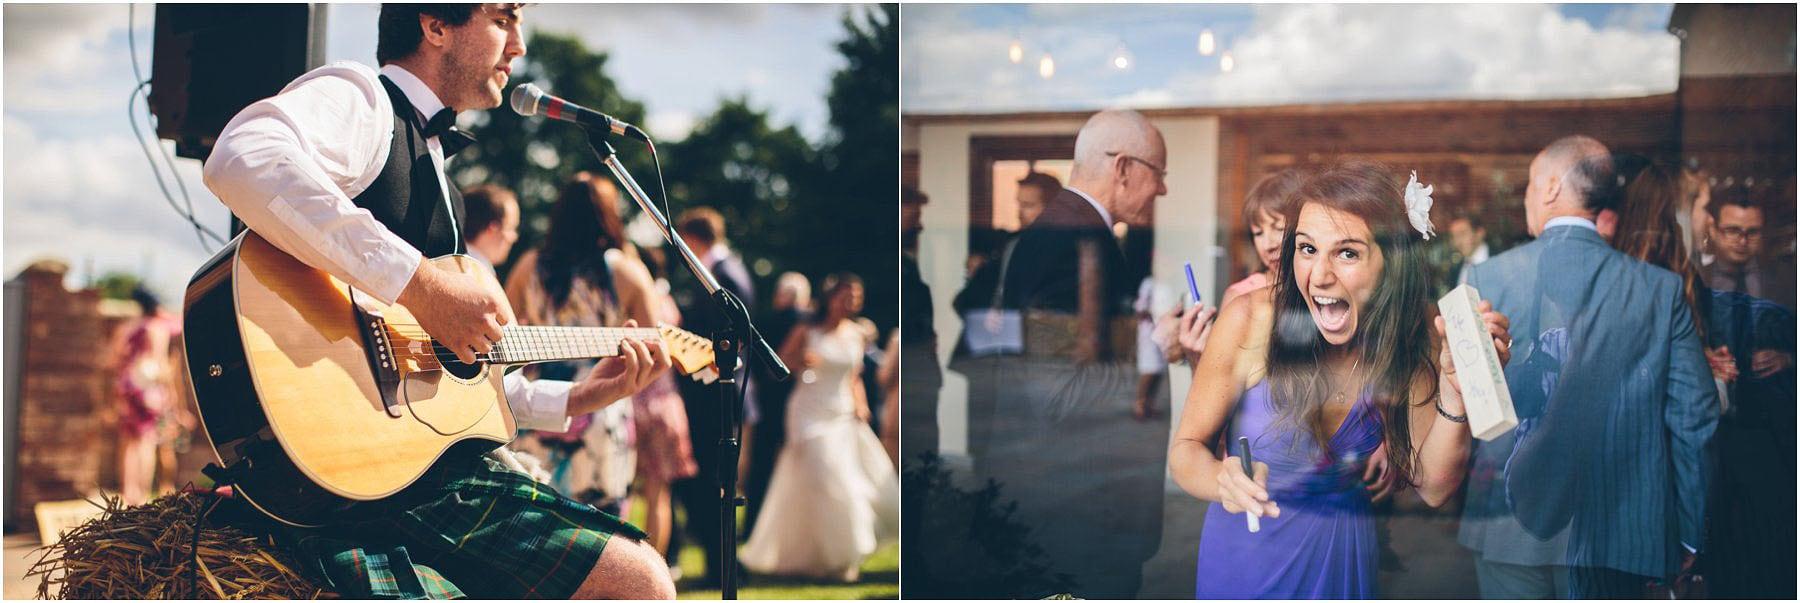 Swallows_Nest_Barn_Wedding_Photography_0130